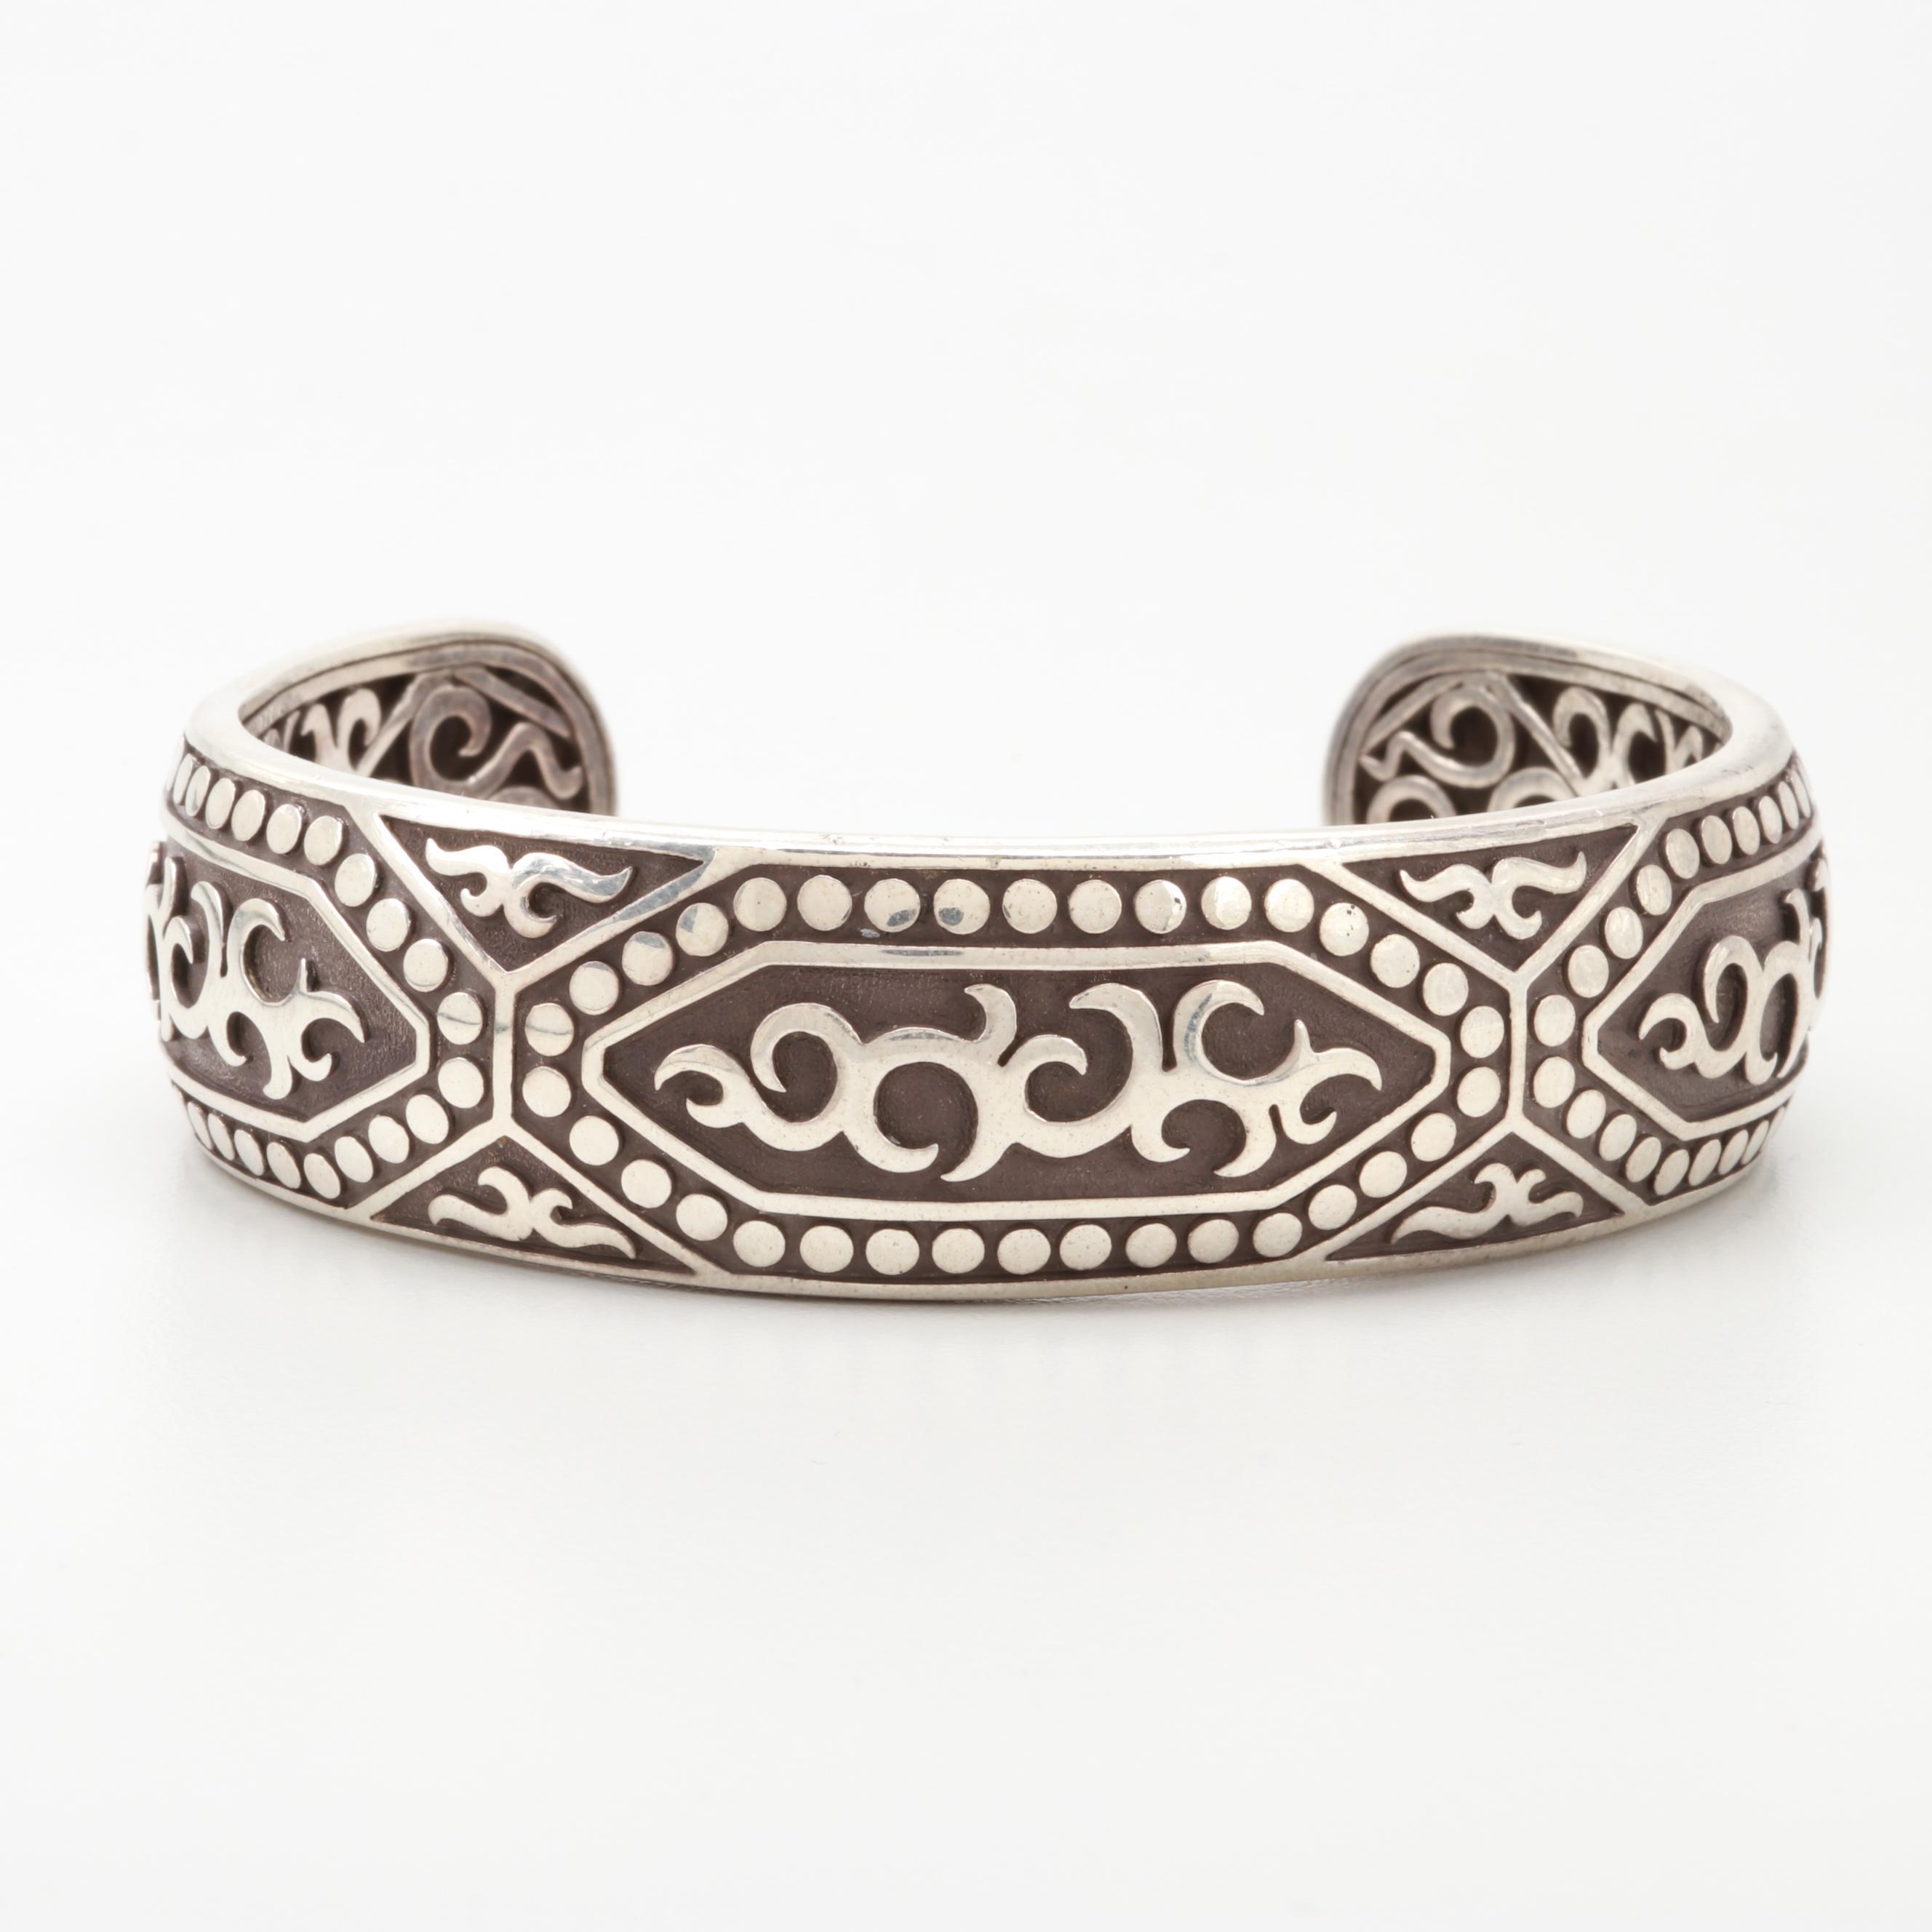 John Hardy Sterling Silver Scrolll and Dot Overlay Cuff Bracelet